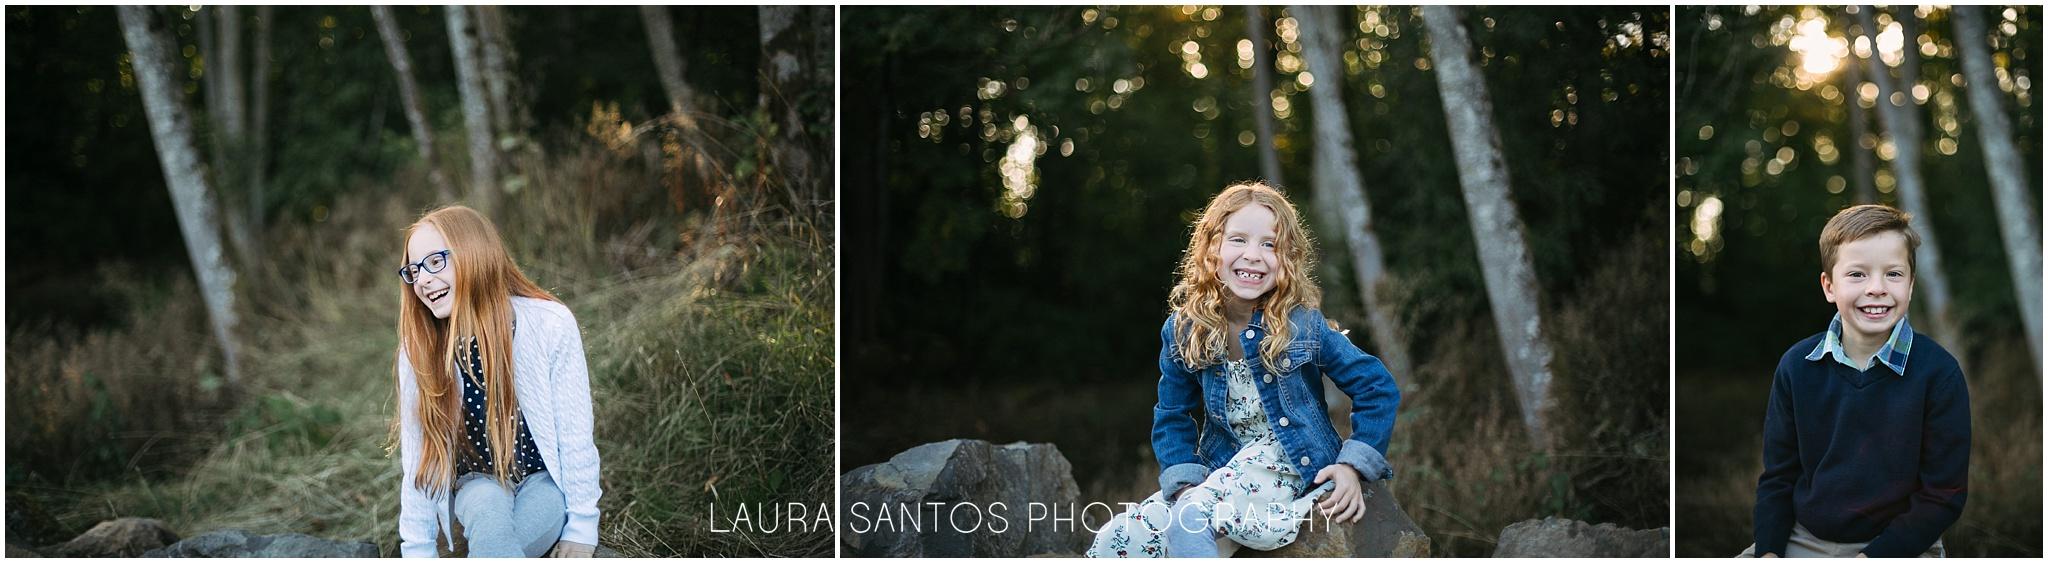 Portland OR Family Photograher Laura Santos Photography_0148.jpg